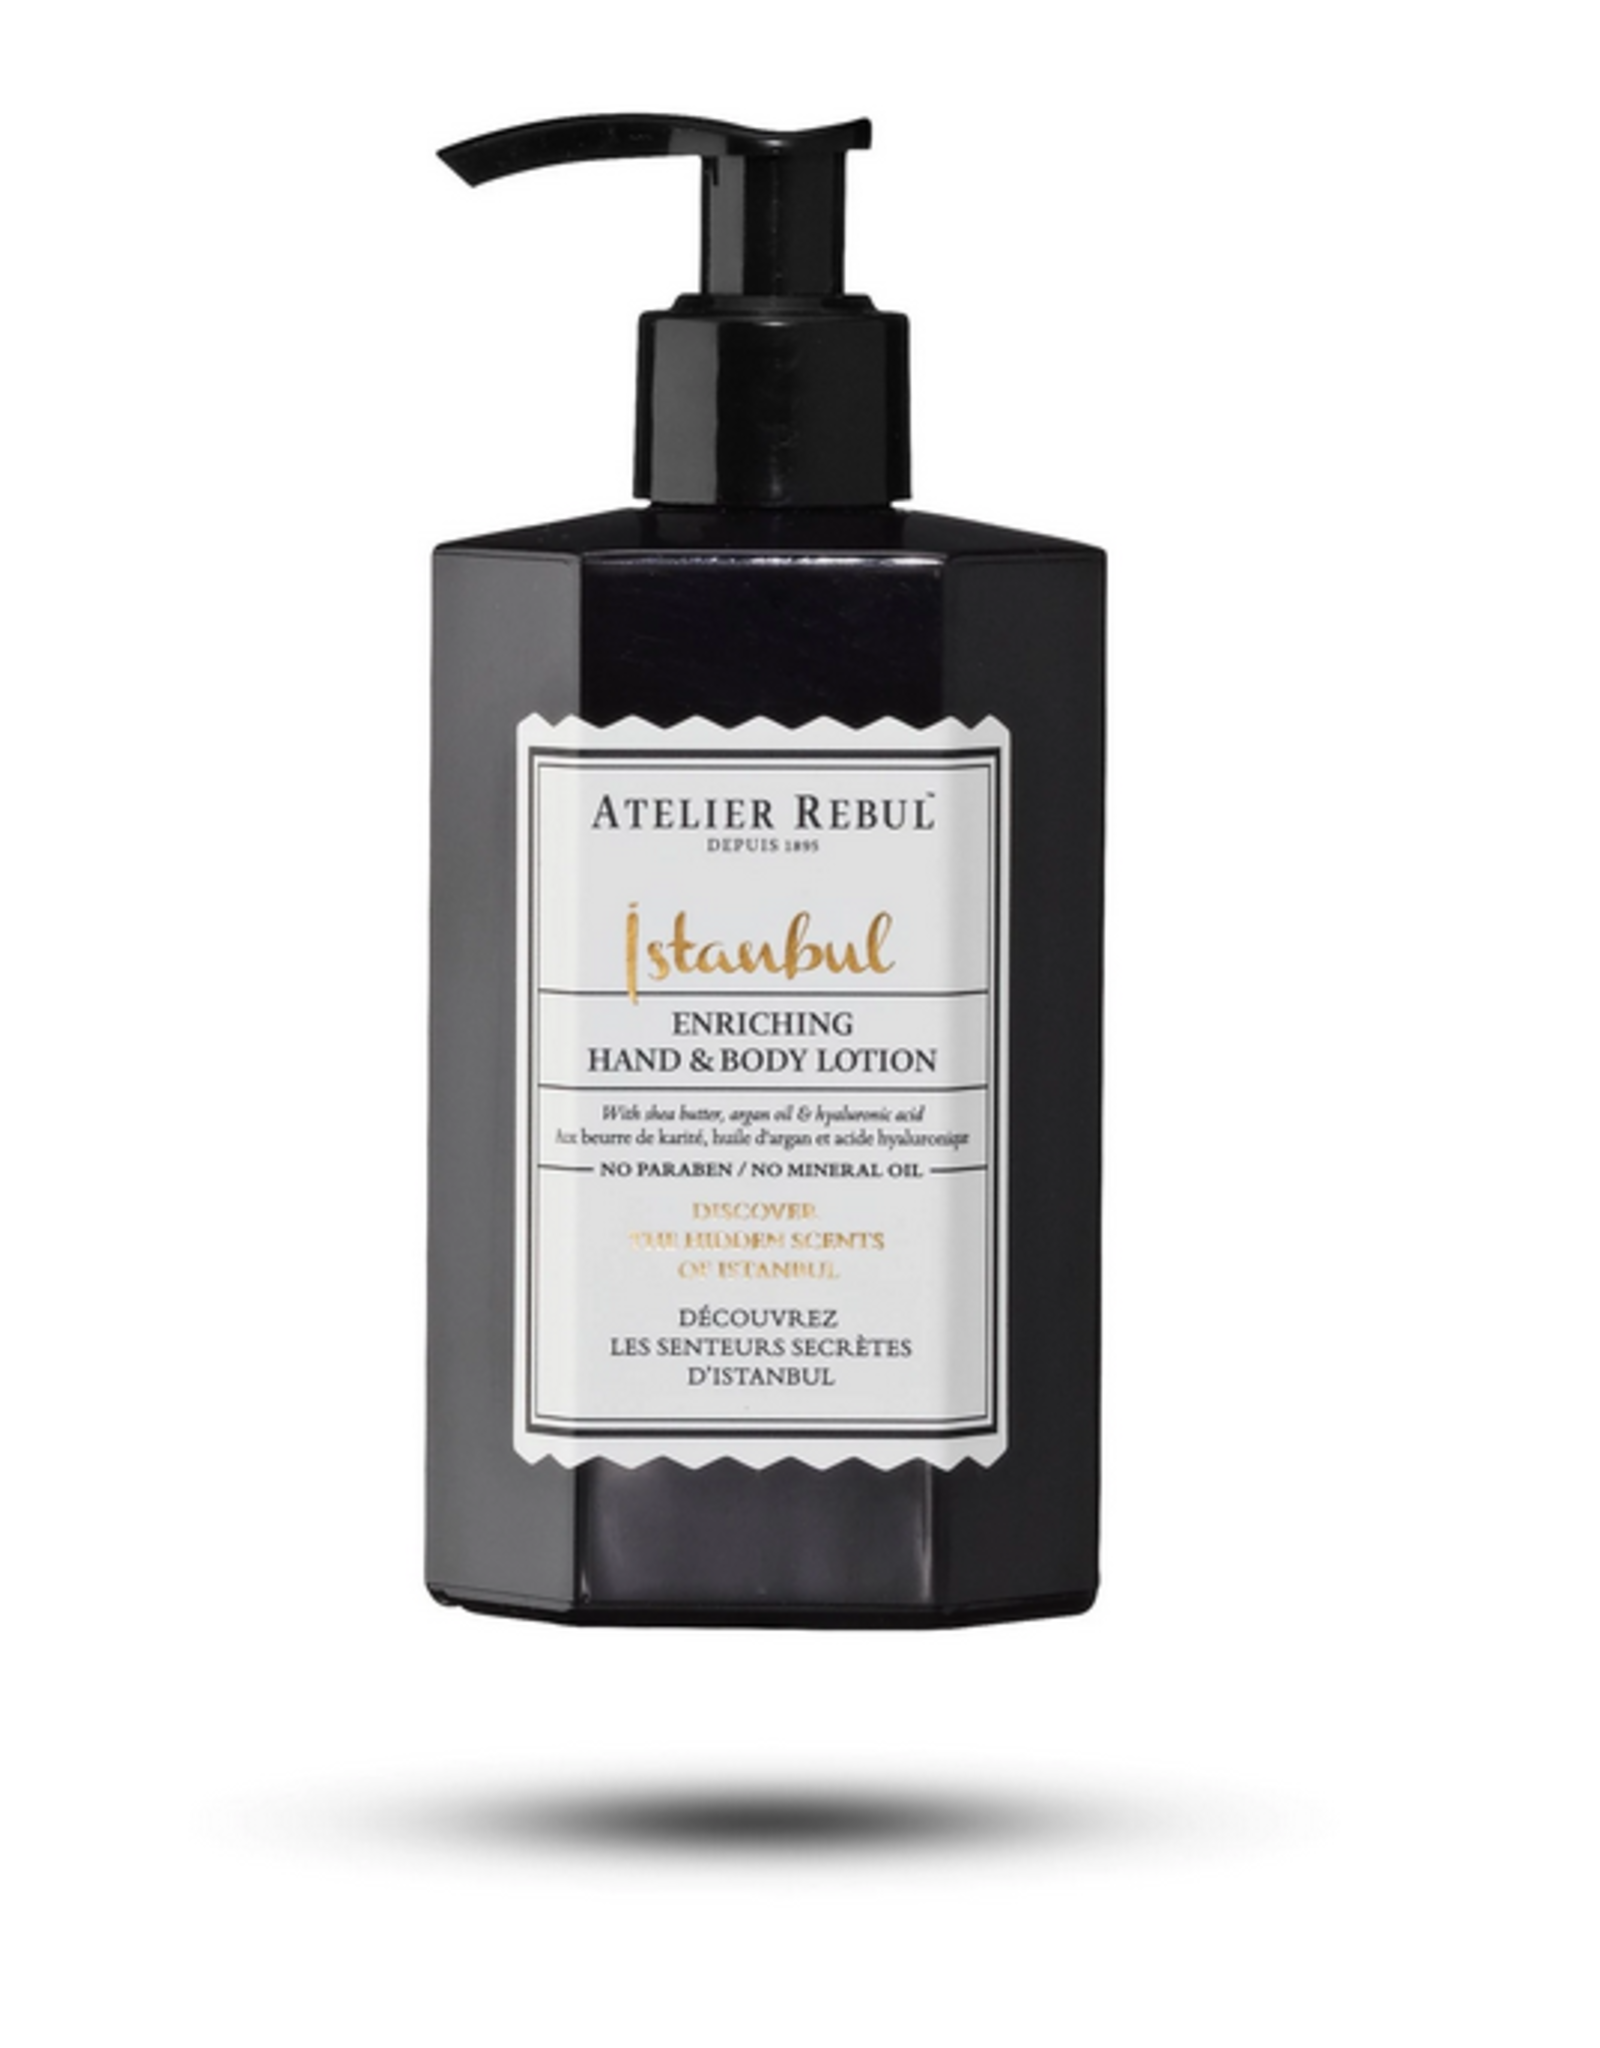 Atelier Rebul Atelier Rebul - Istanbul enriching hand & body lotion - 430ml